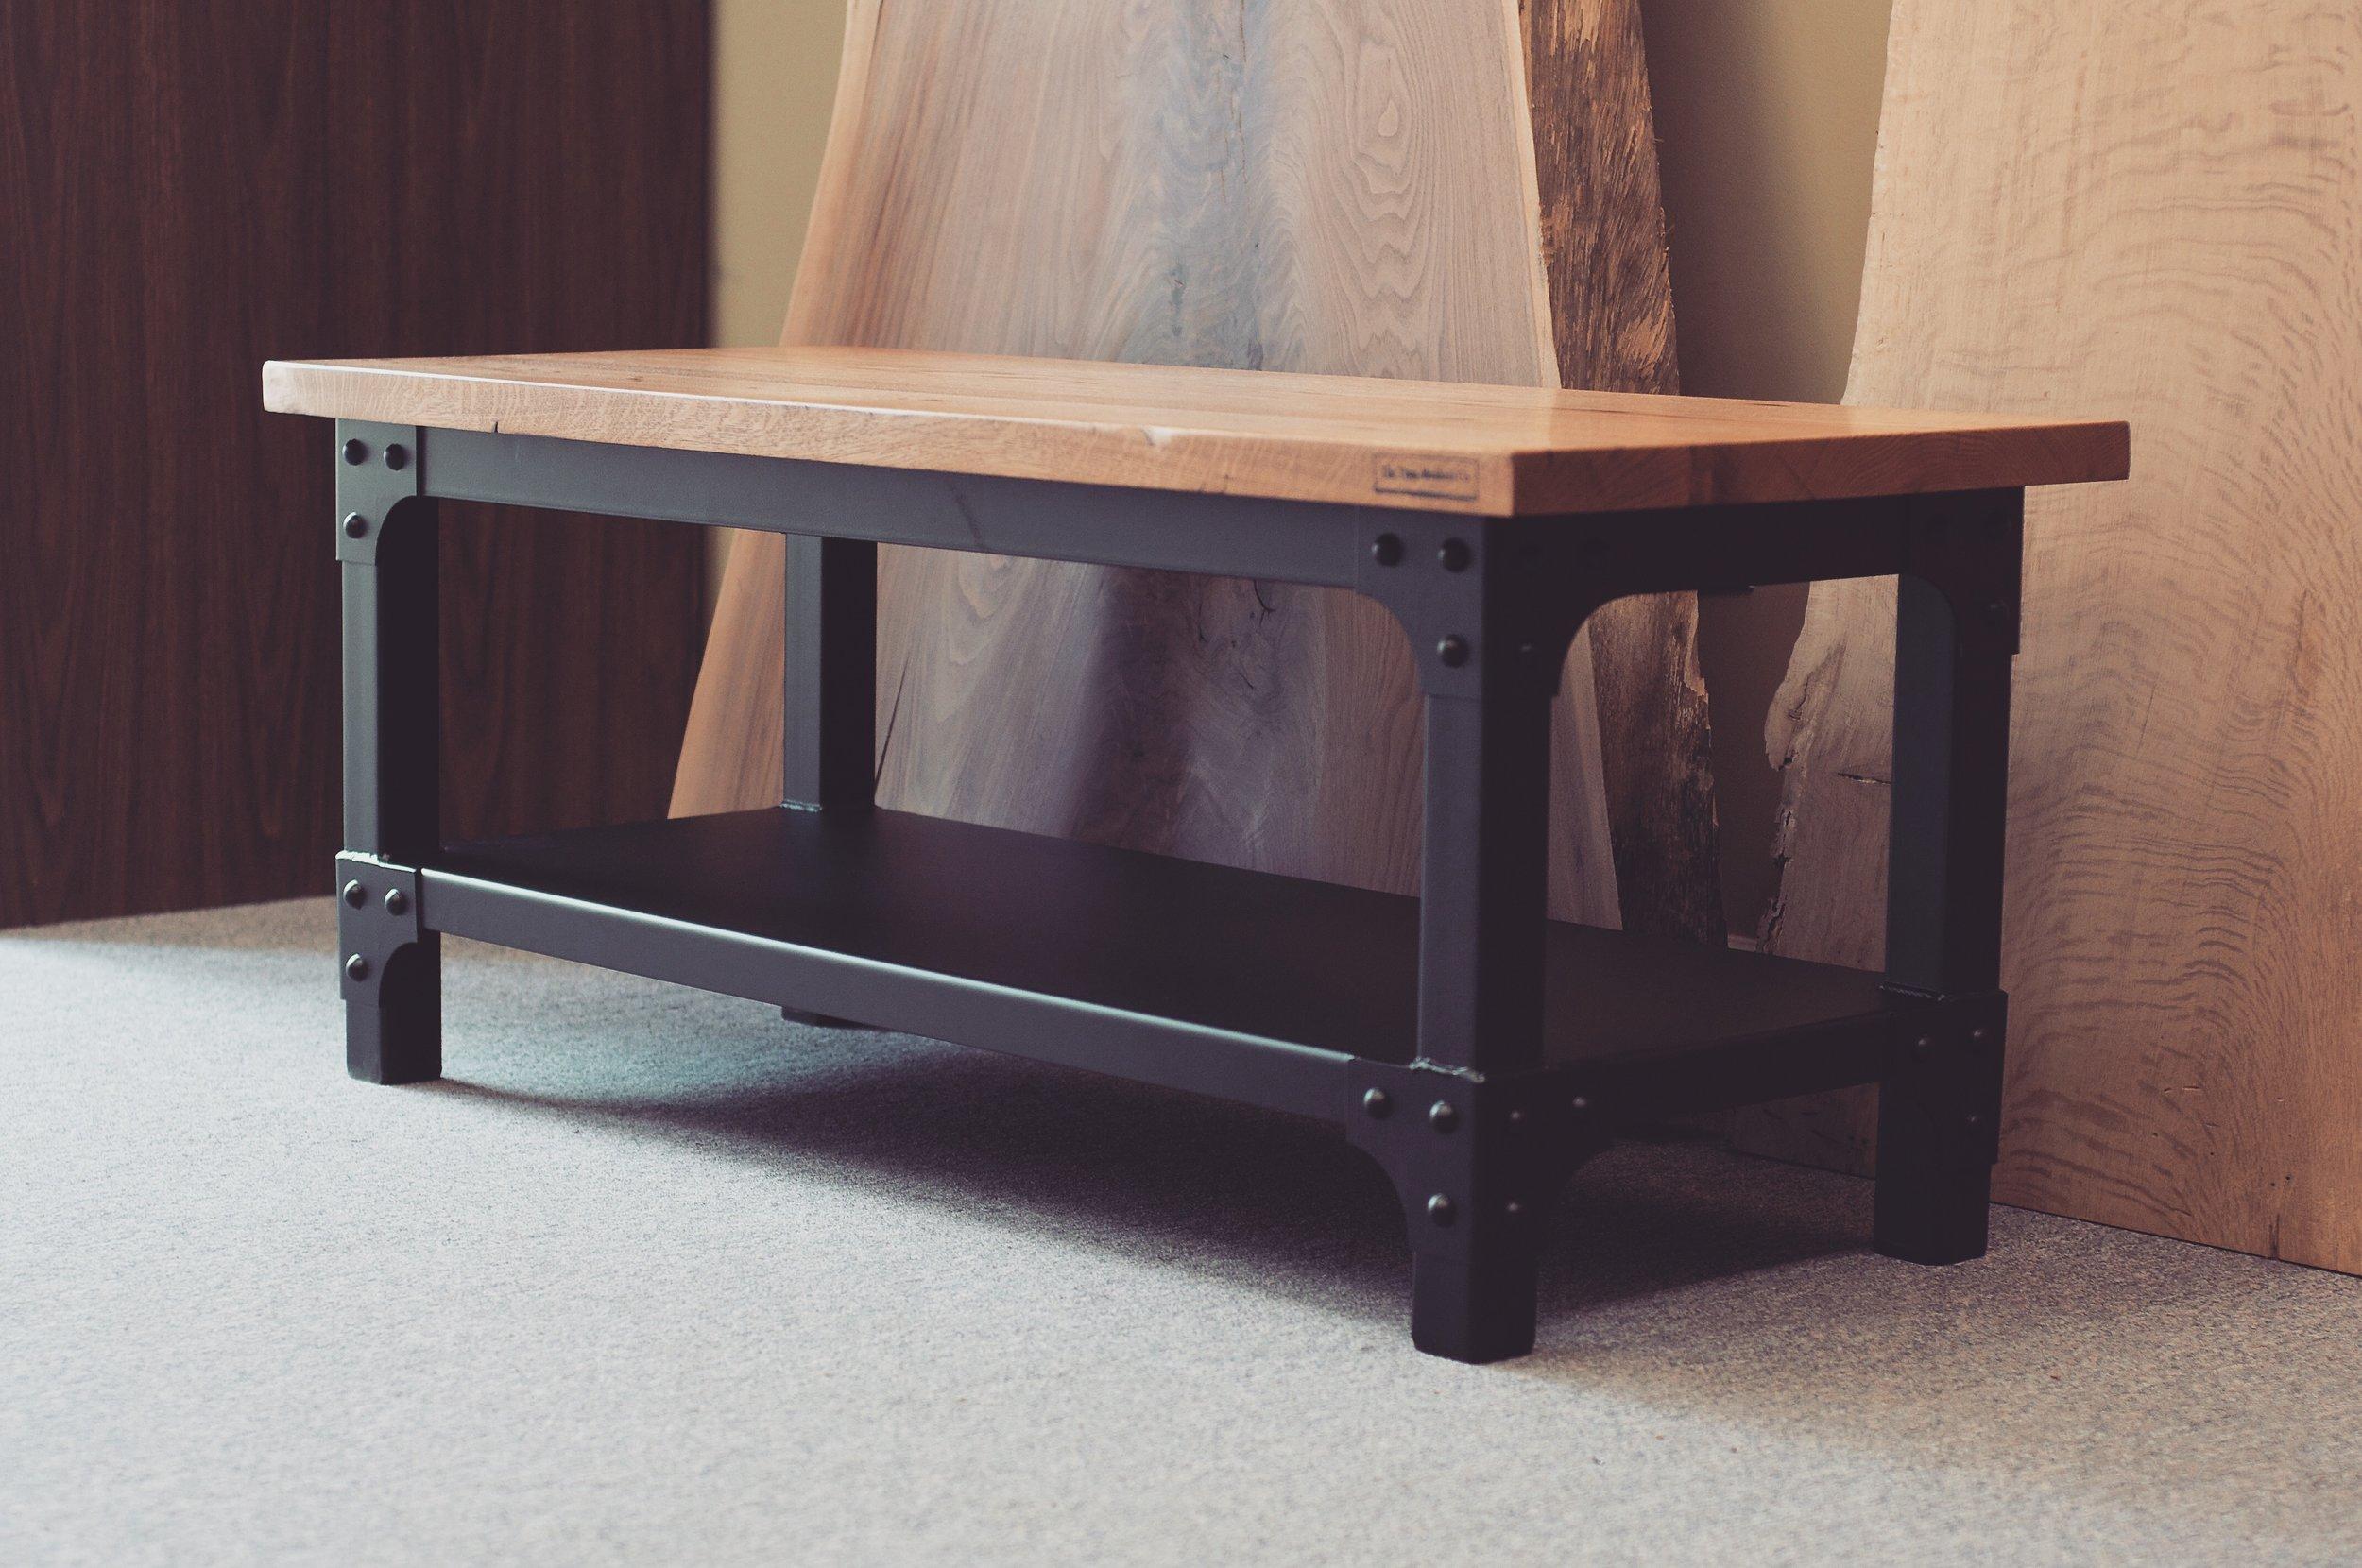 bespoke furniture, custom handmade coffee table